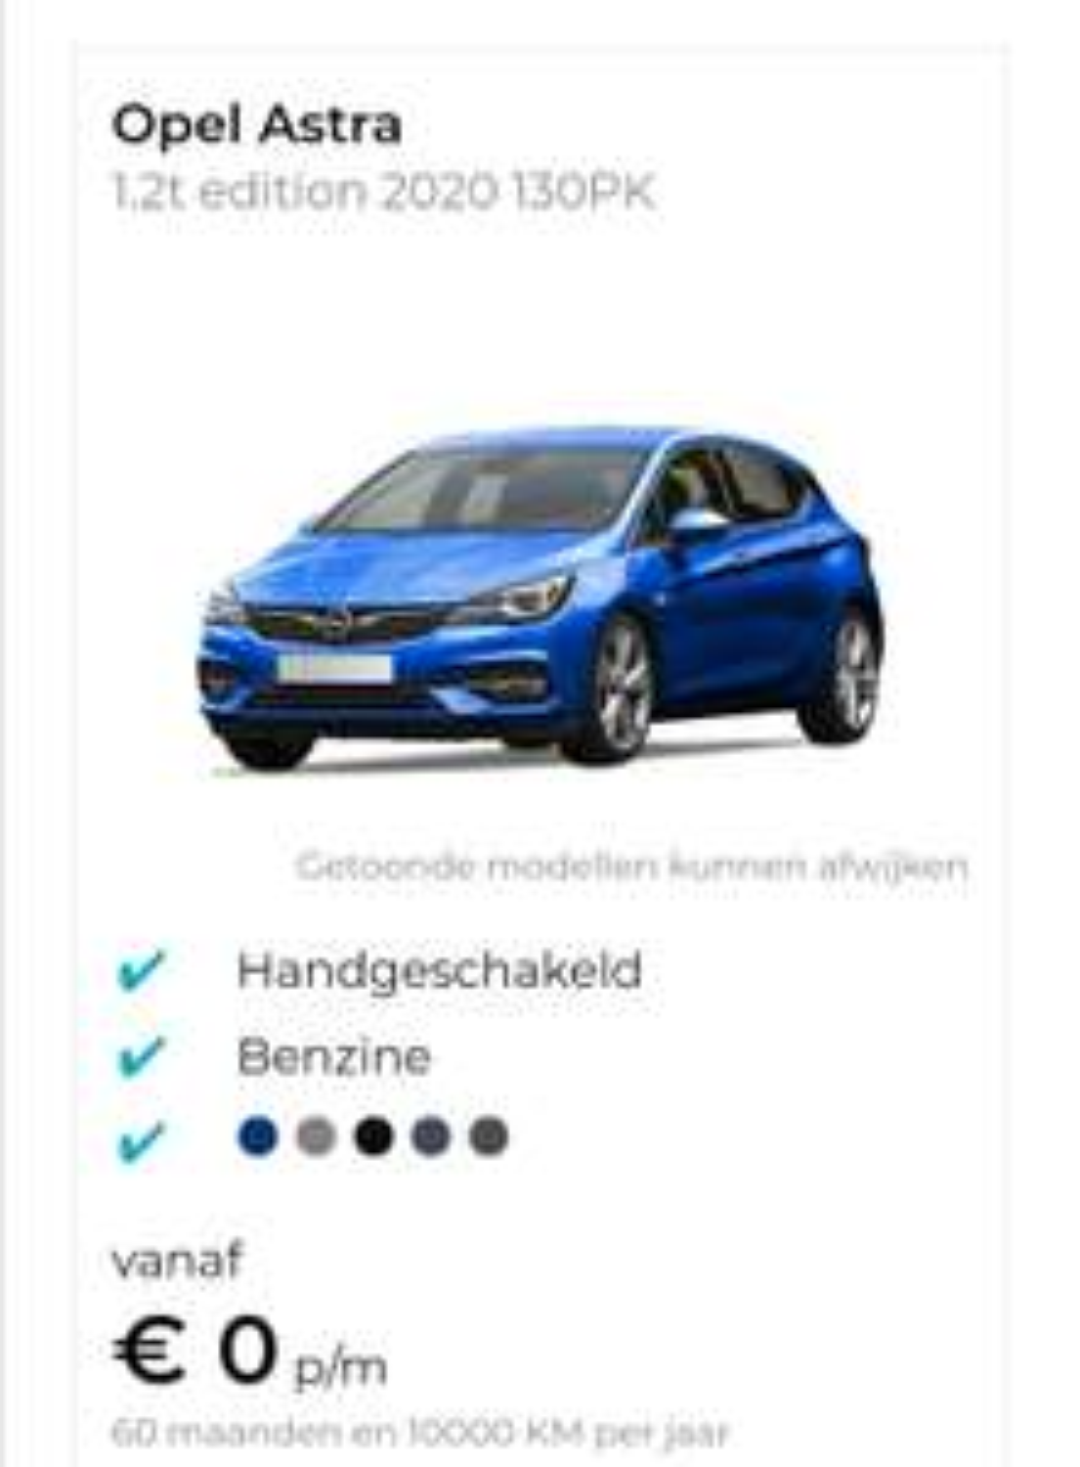 Opel Astra 1.2t edition 2020 130PK private lease zonder basisprijs.